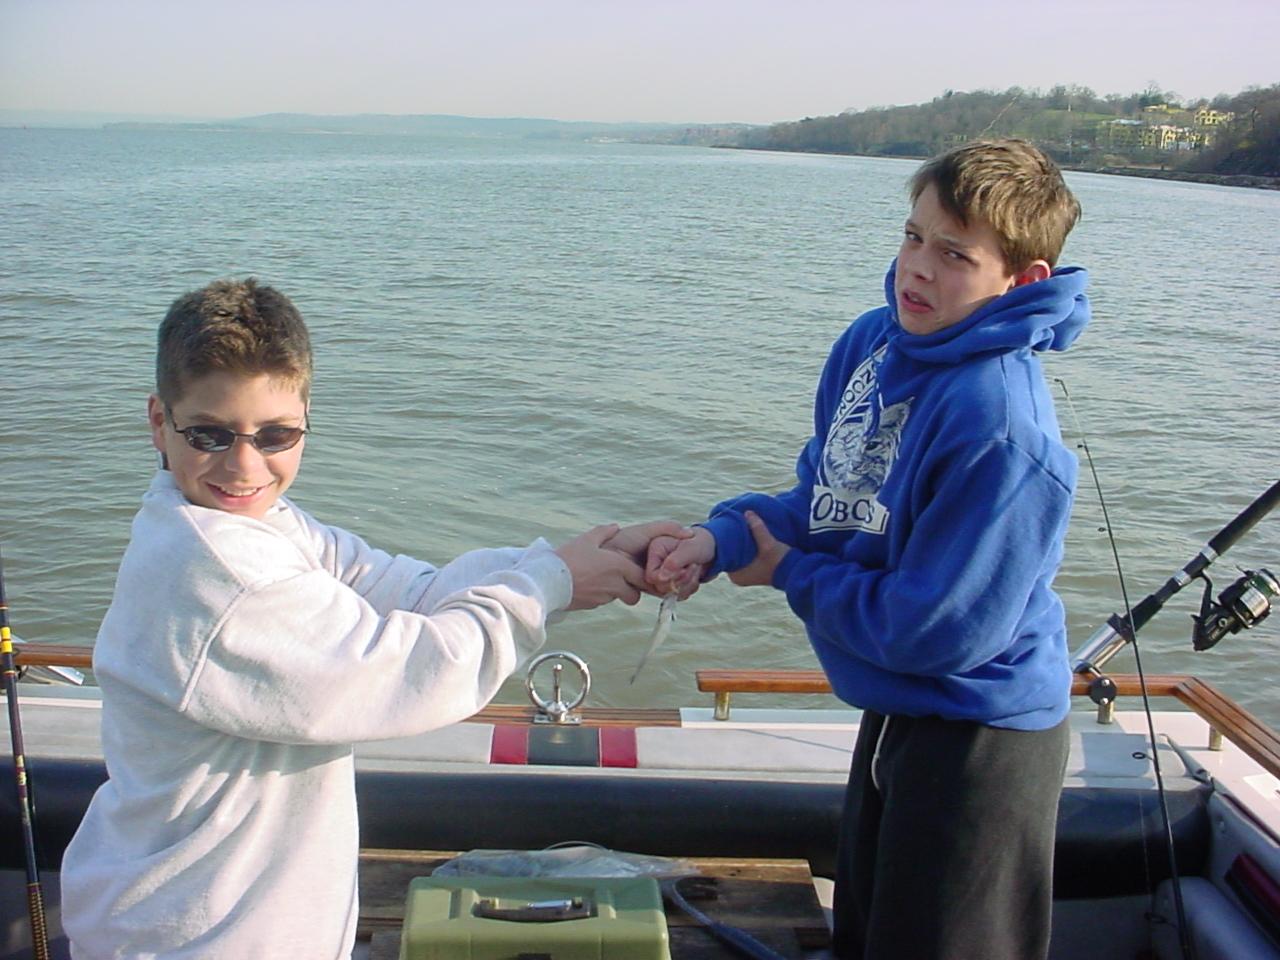 BoatingWithBob-private-boat-charter-Lake-George-New-York-fishing3.JPG